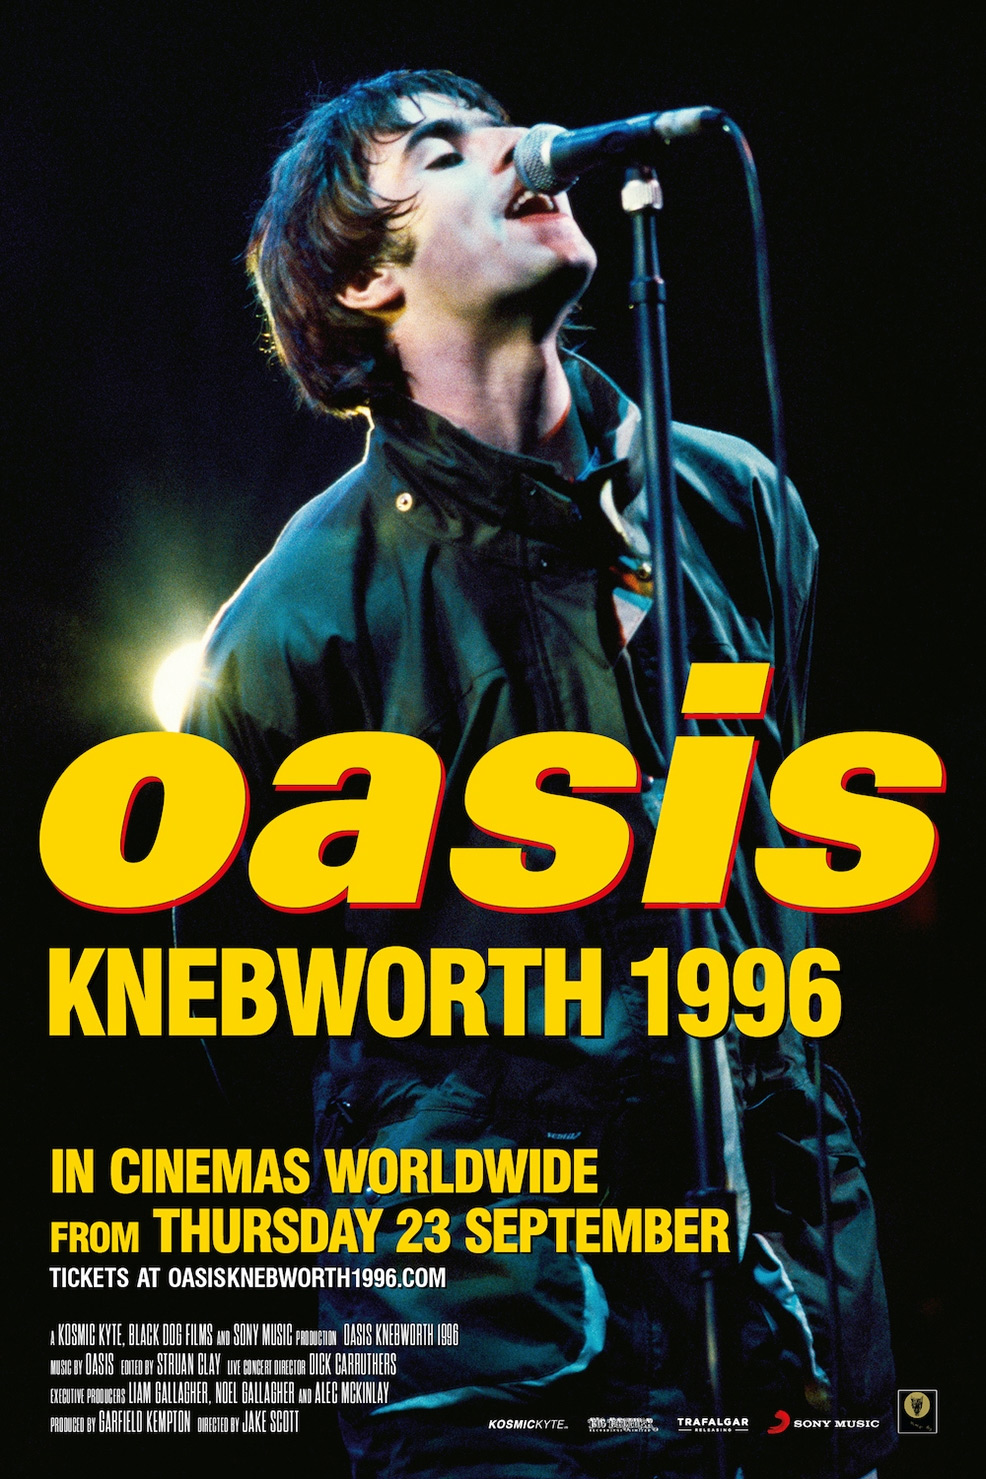 Oasis Knebworth 1996 Poster